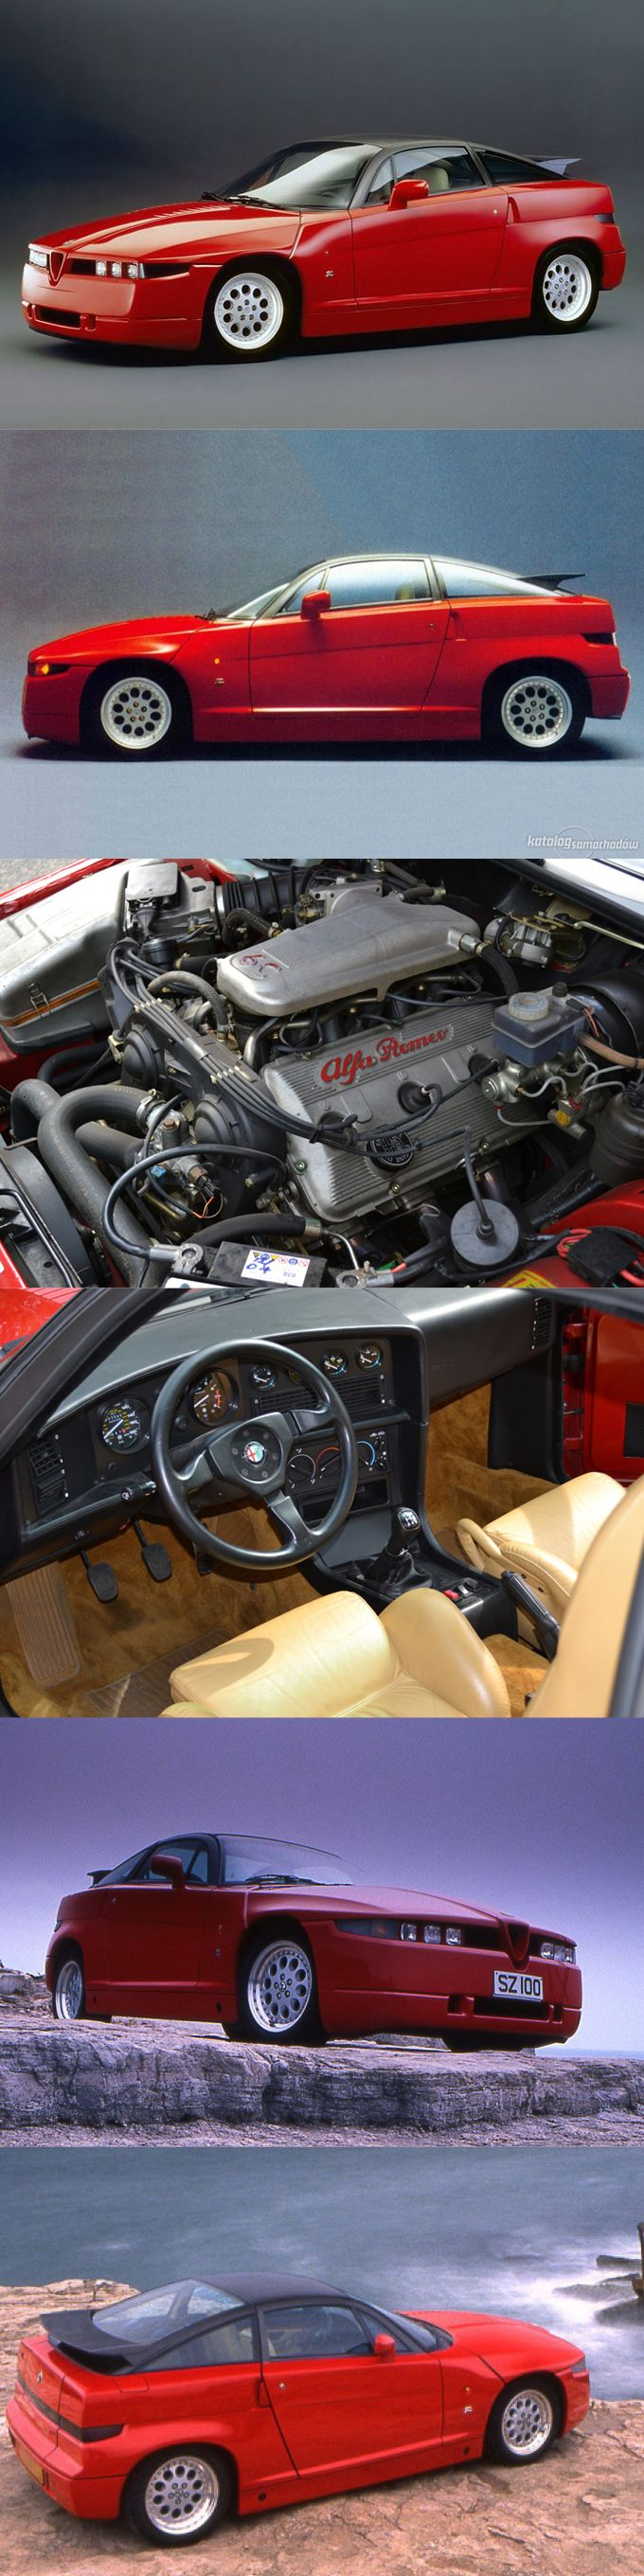 1989 Alfa Romeo SZ / Italy / red / Opron Zagato / ES-30 / Busso V6